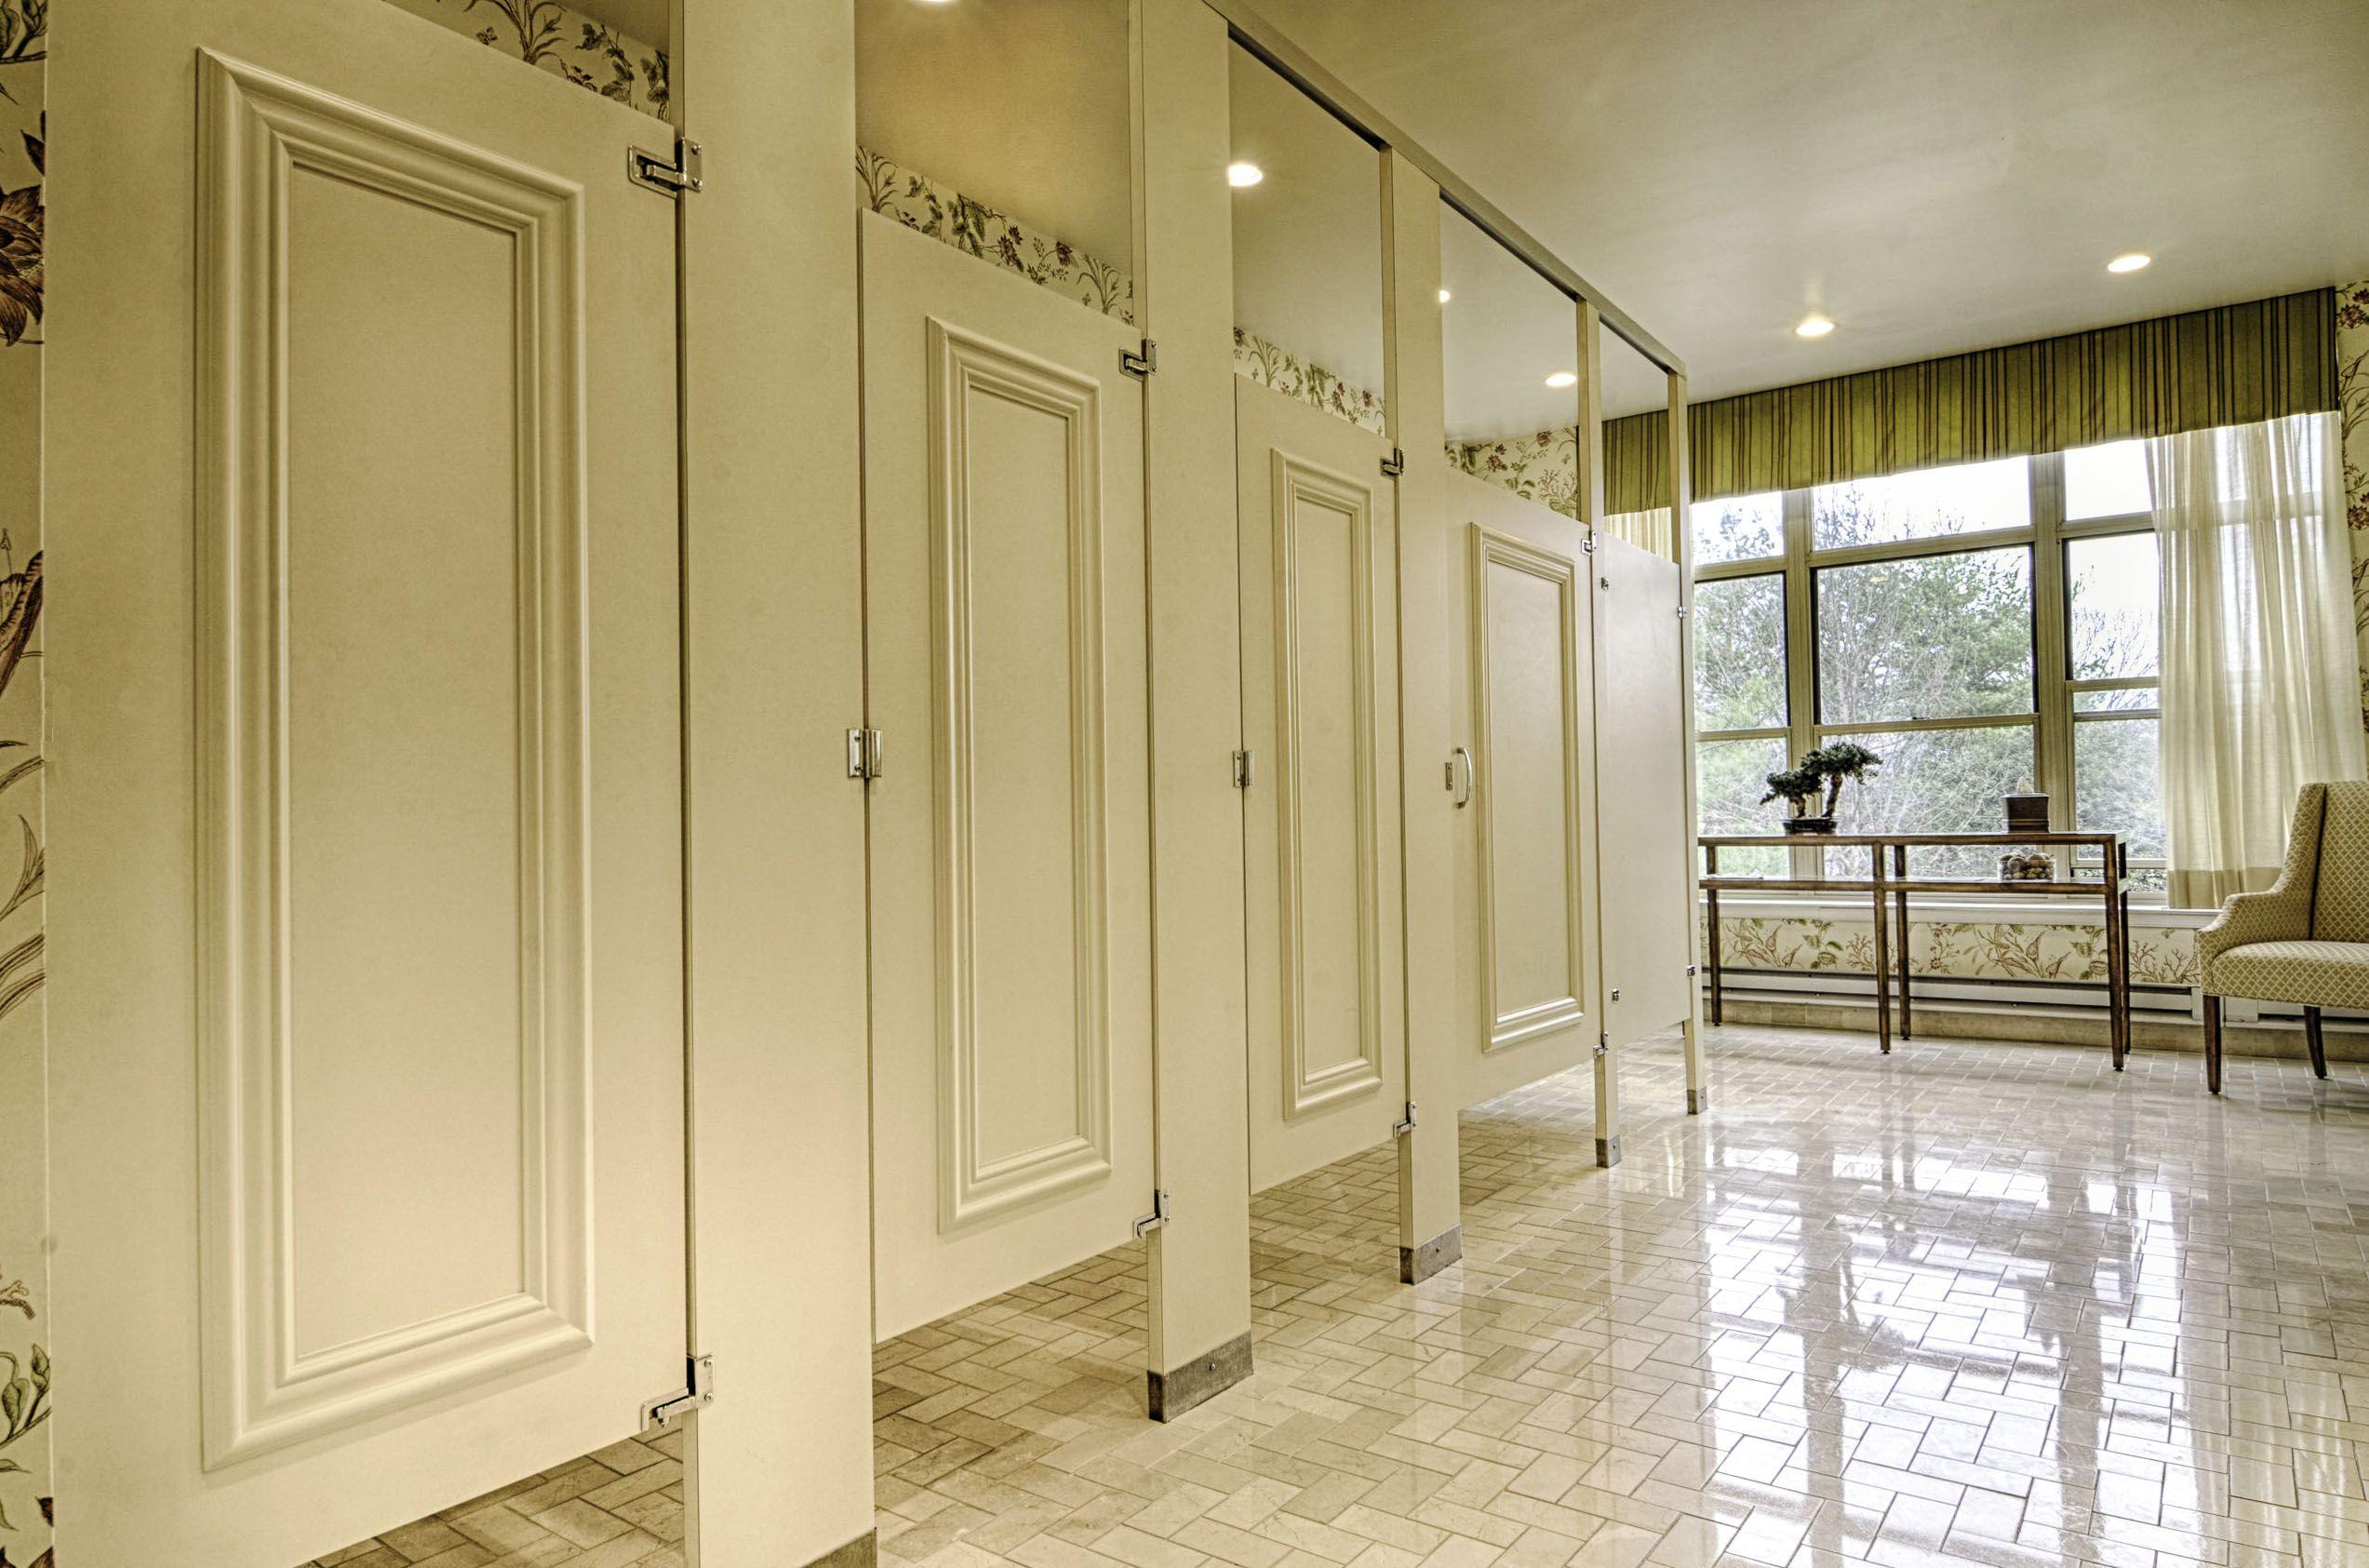 Ironwood Manufacturing Laminate Toilet Partitions And Bathroom Doors - Plastic laminate bathroom partitions